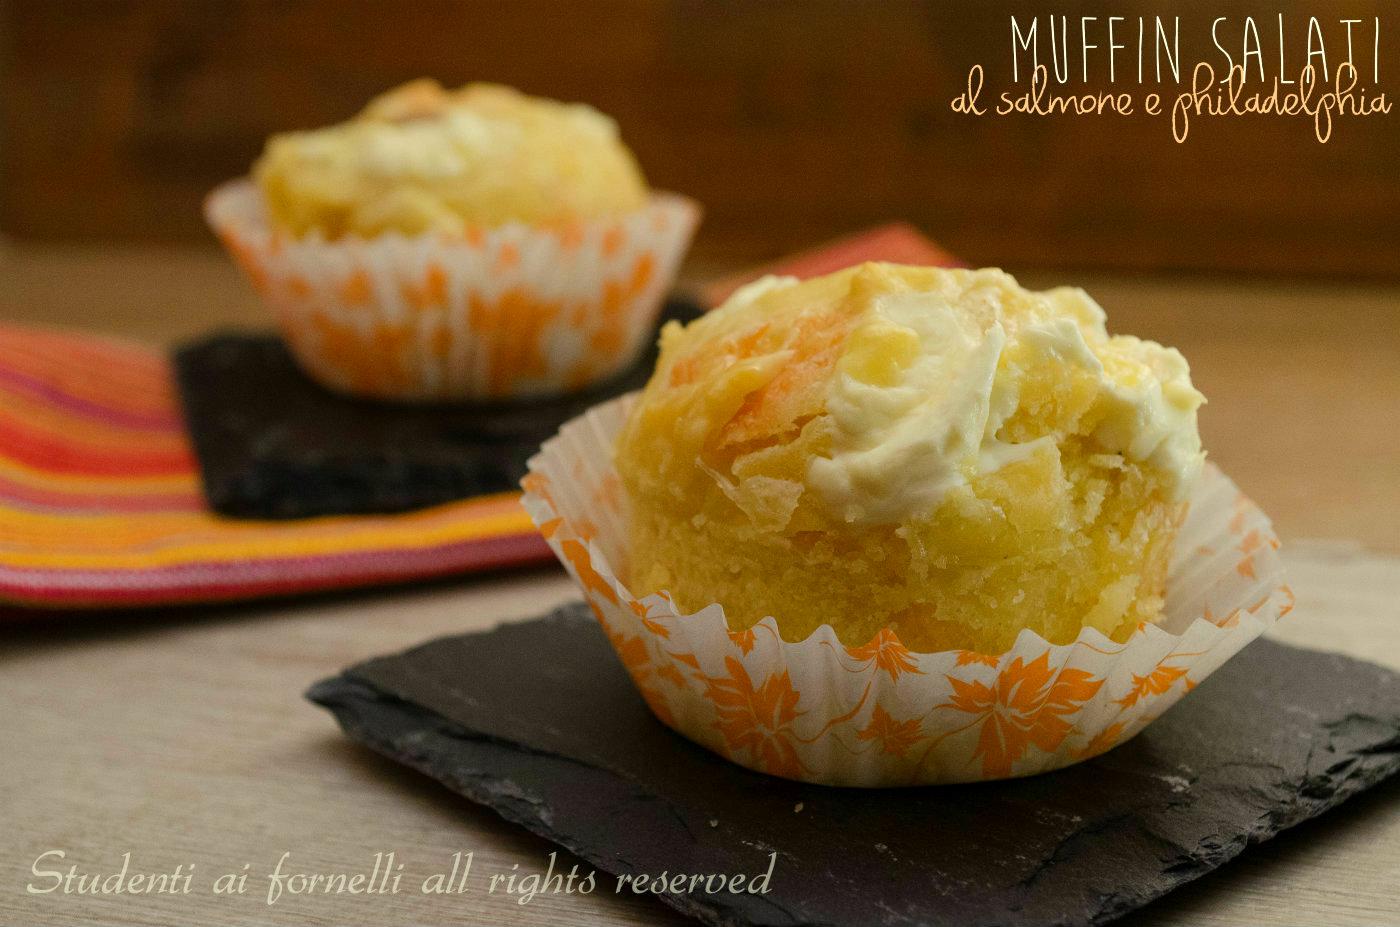 Top Muffin salati salmone e philadelphia, ricetta finger food veloce IX99